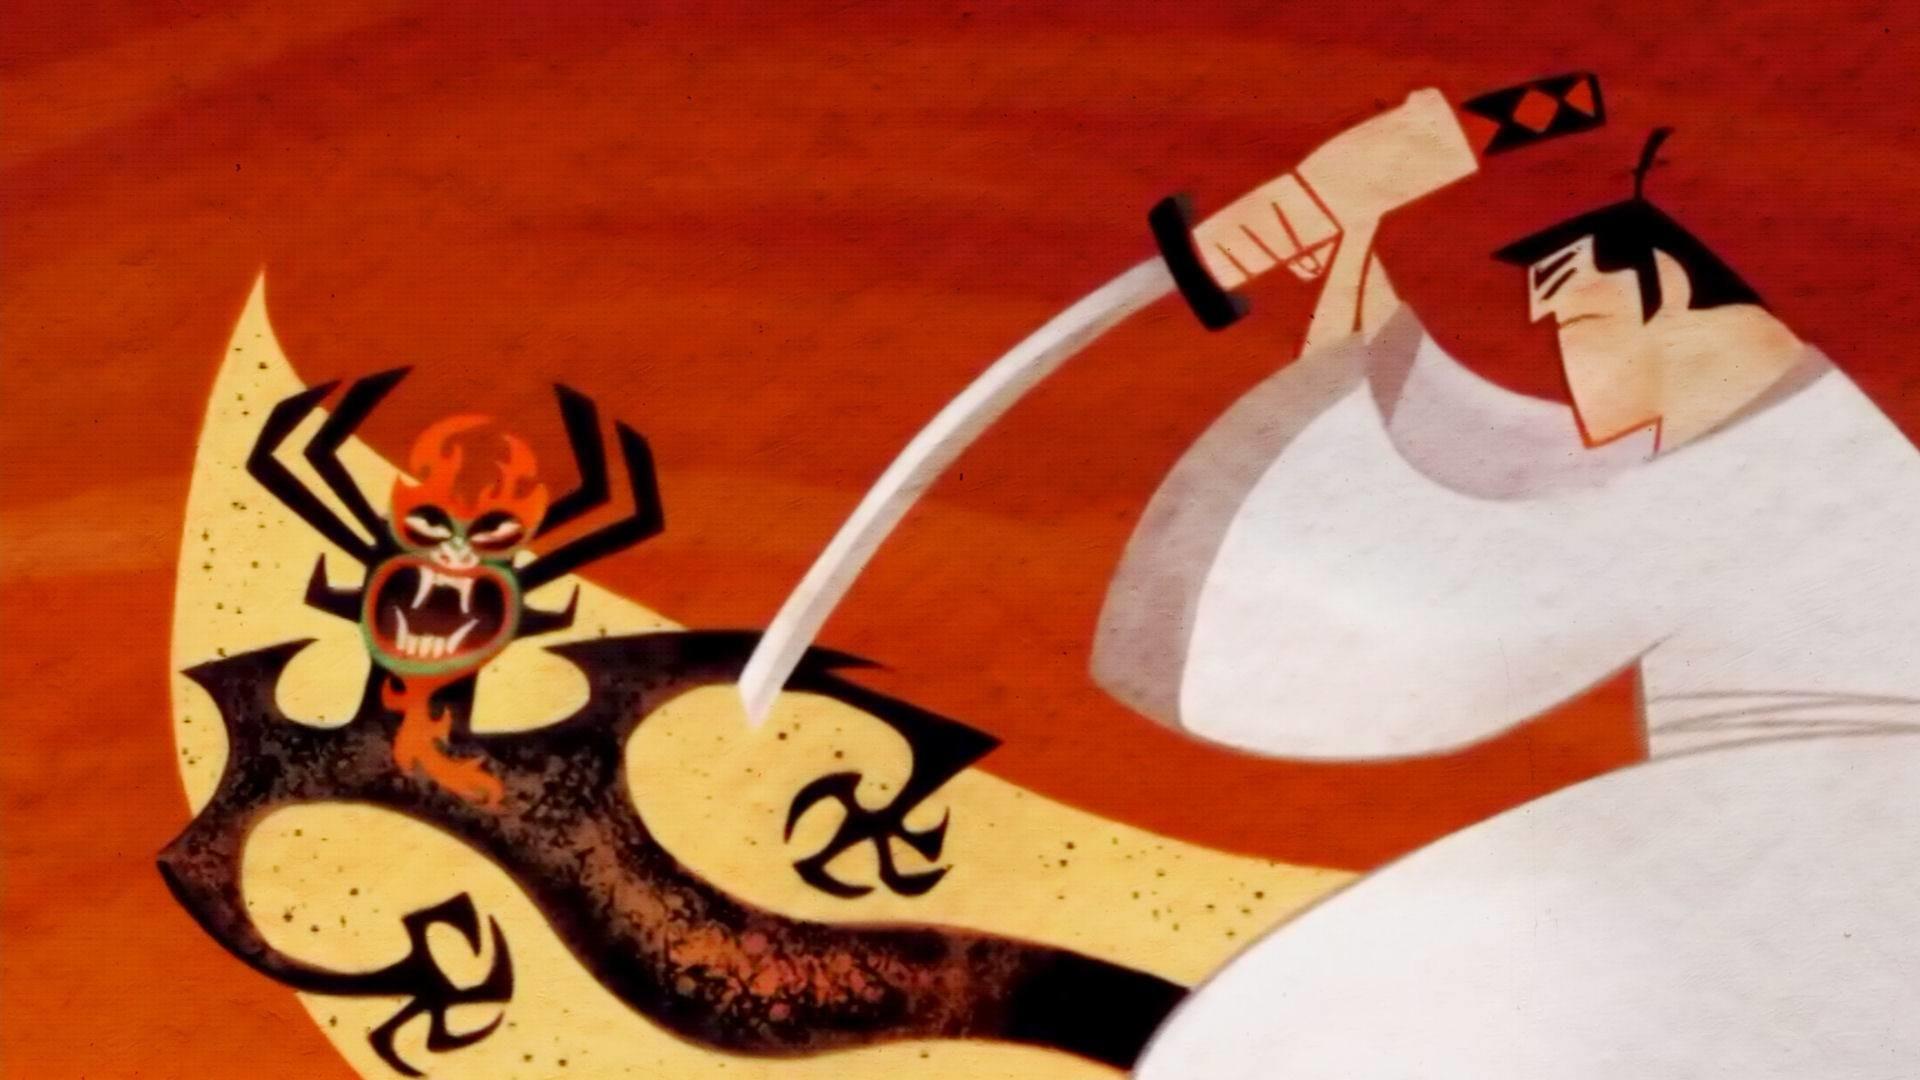 Samurai Jack – Samurai Jack Wallpaper